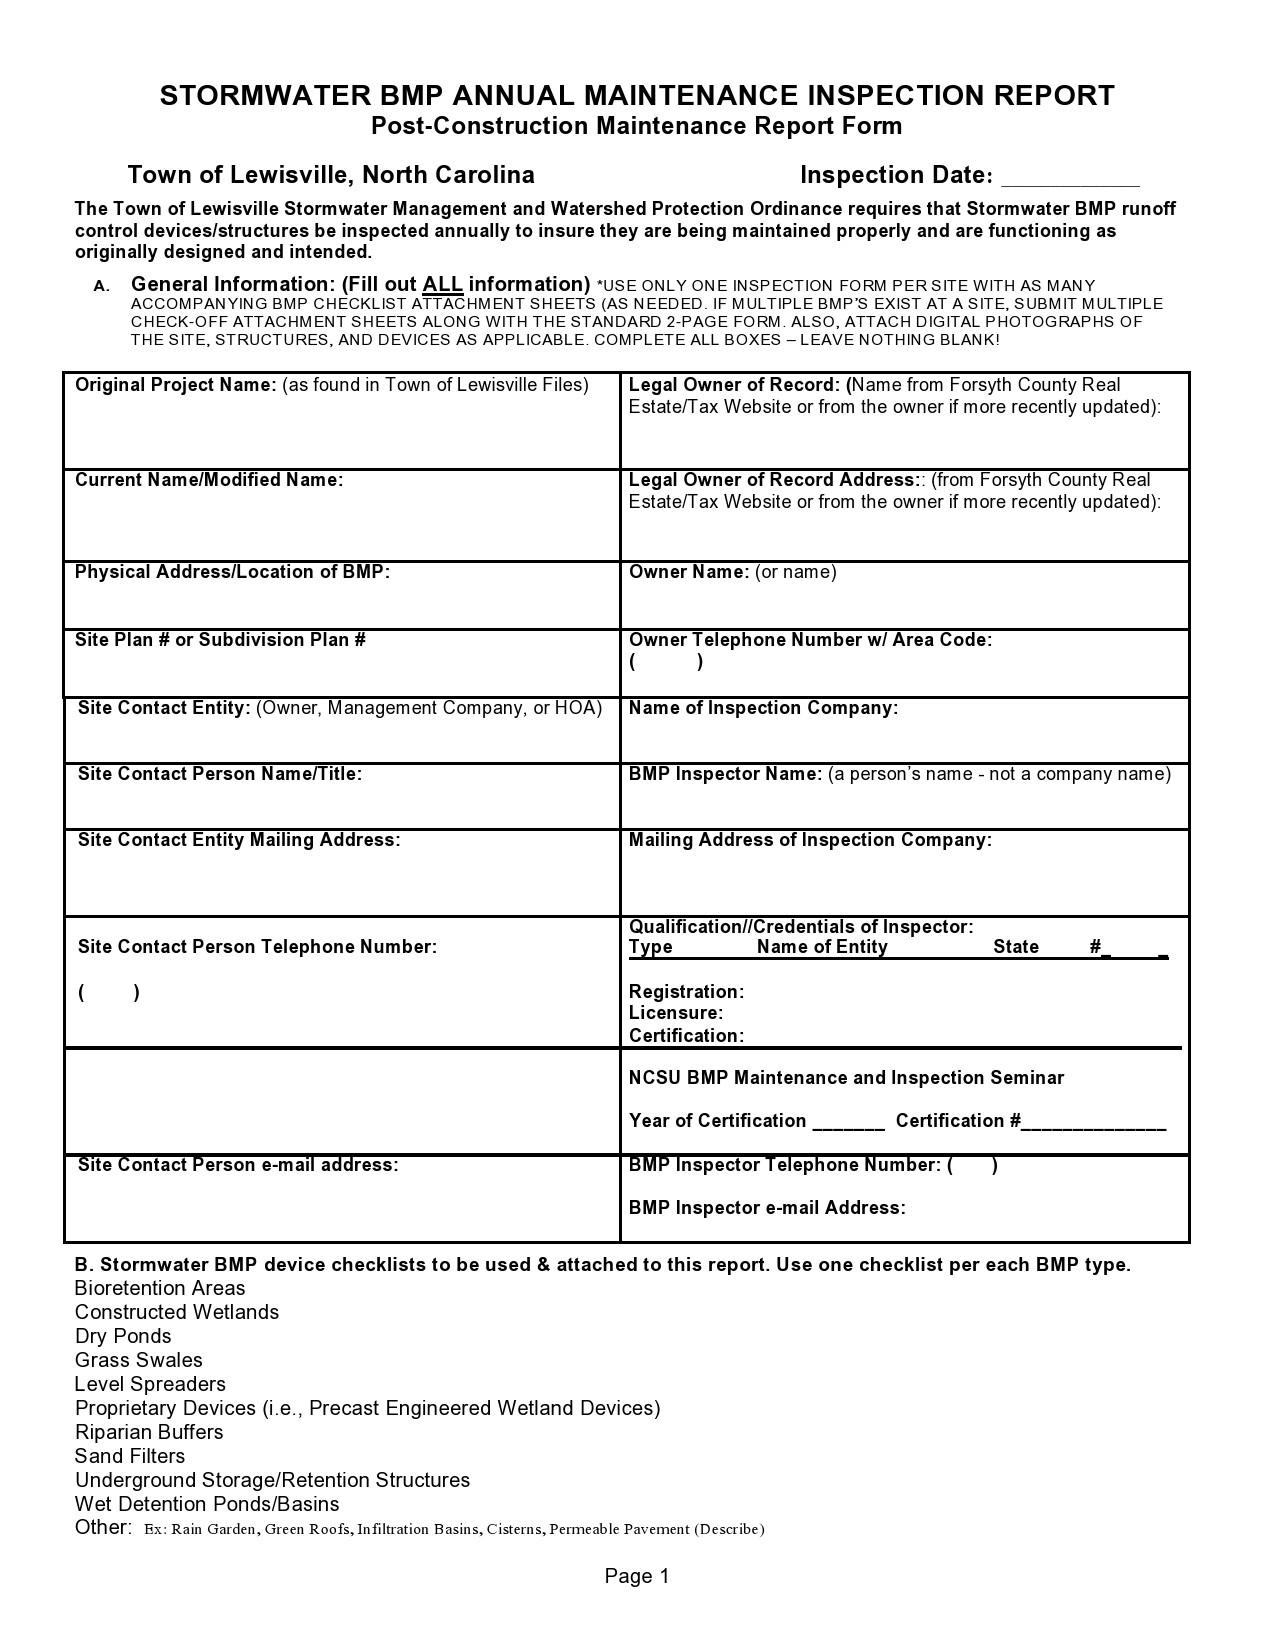 Free maintenance report form 09